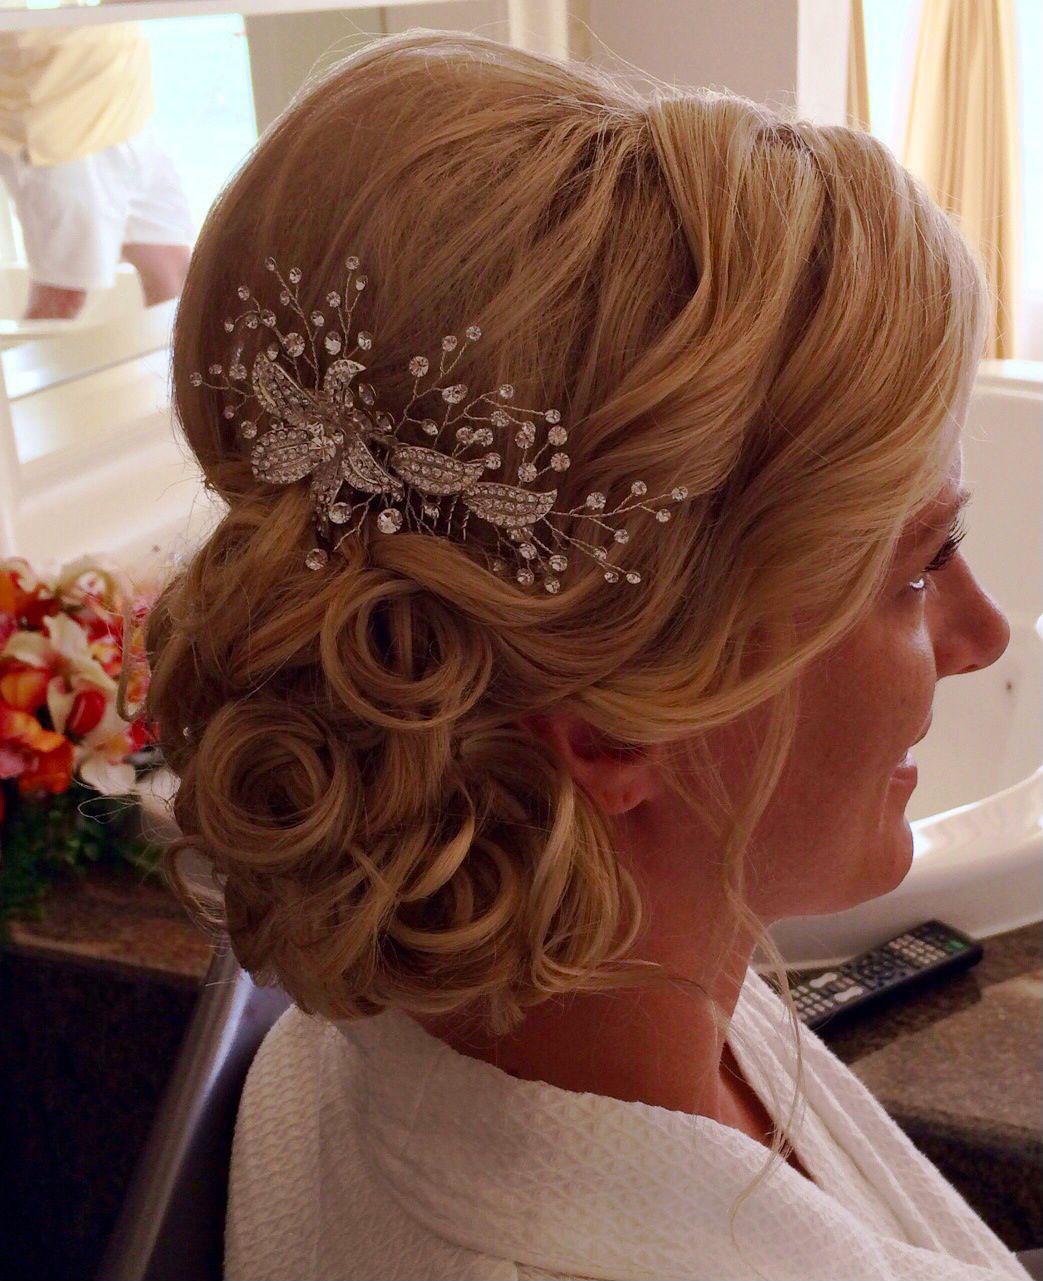 wedding hair elegant messy side bun updo | my destination